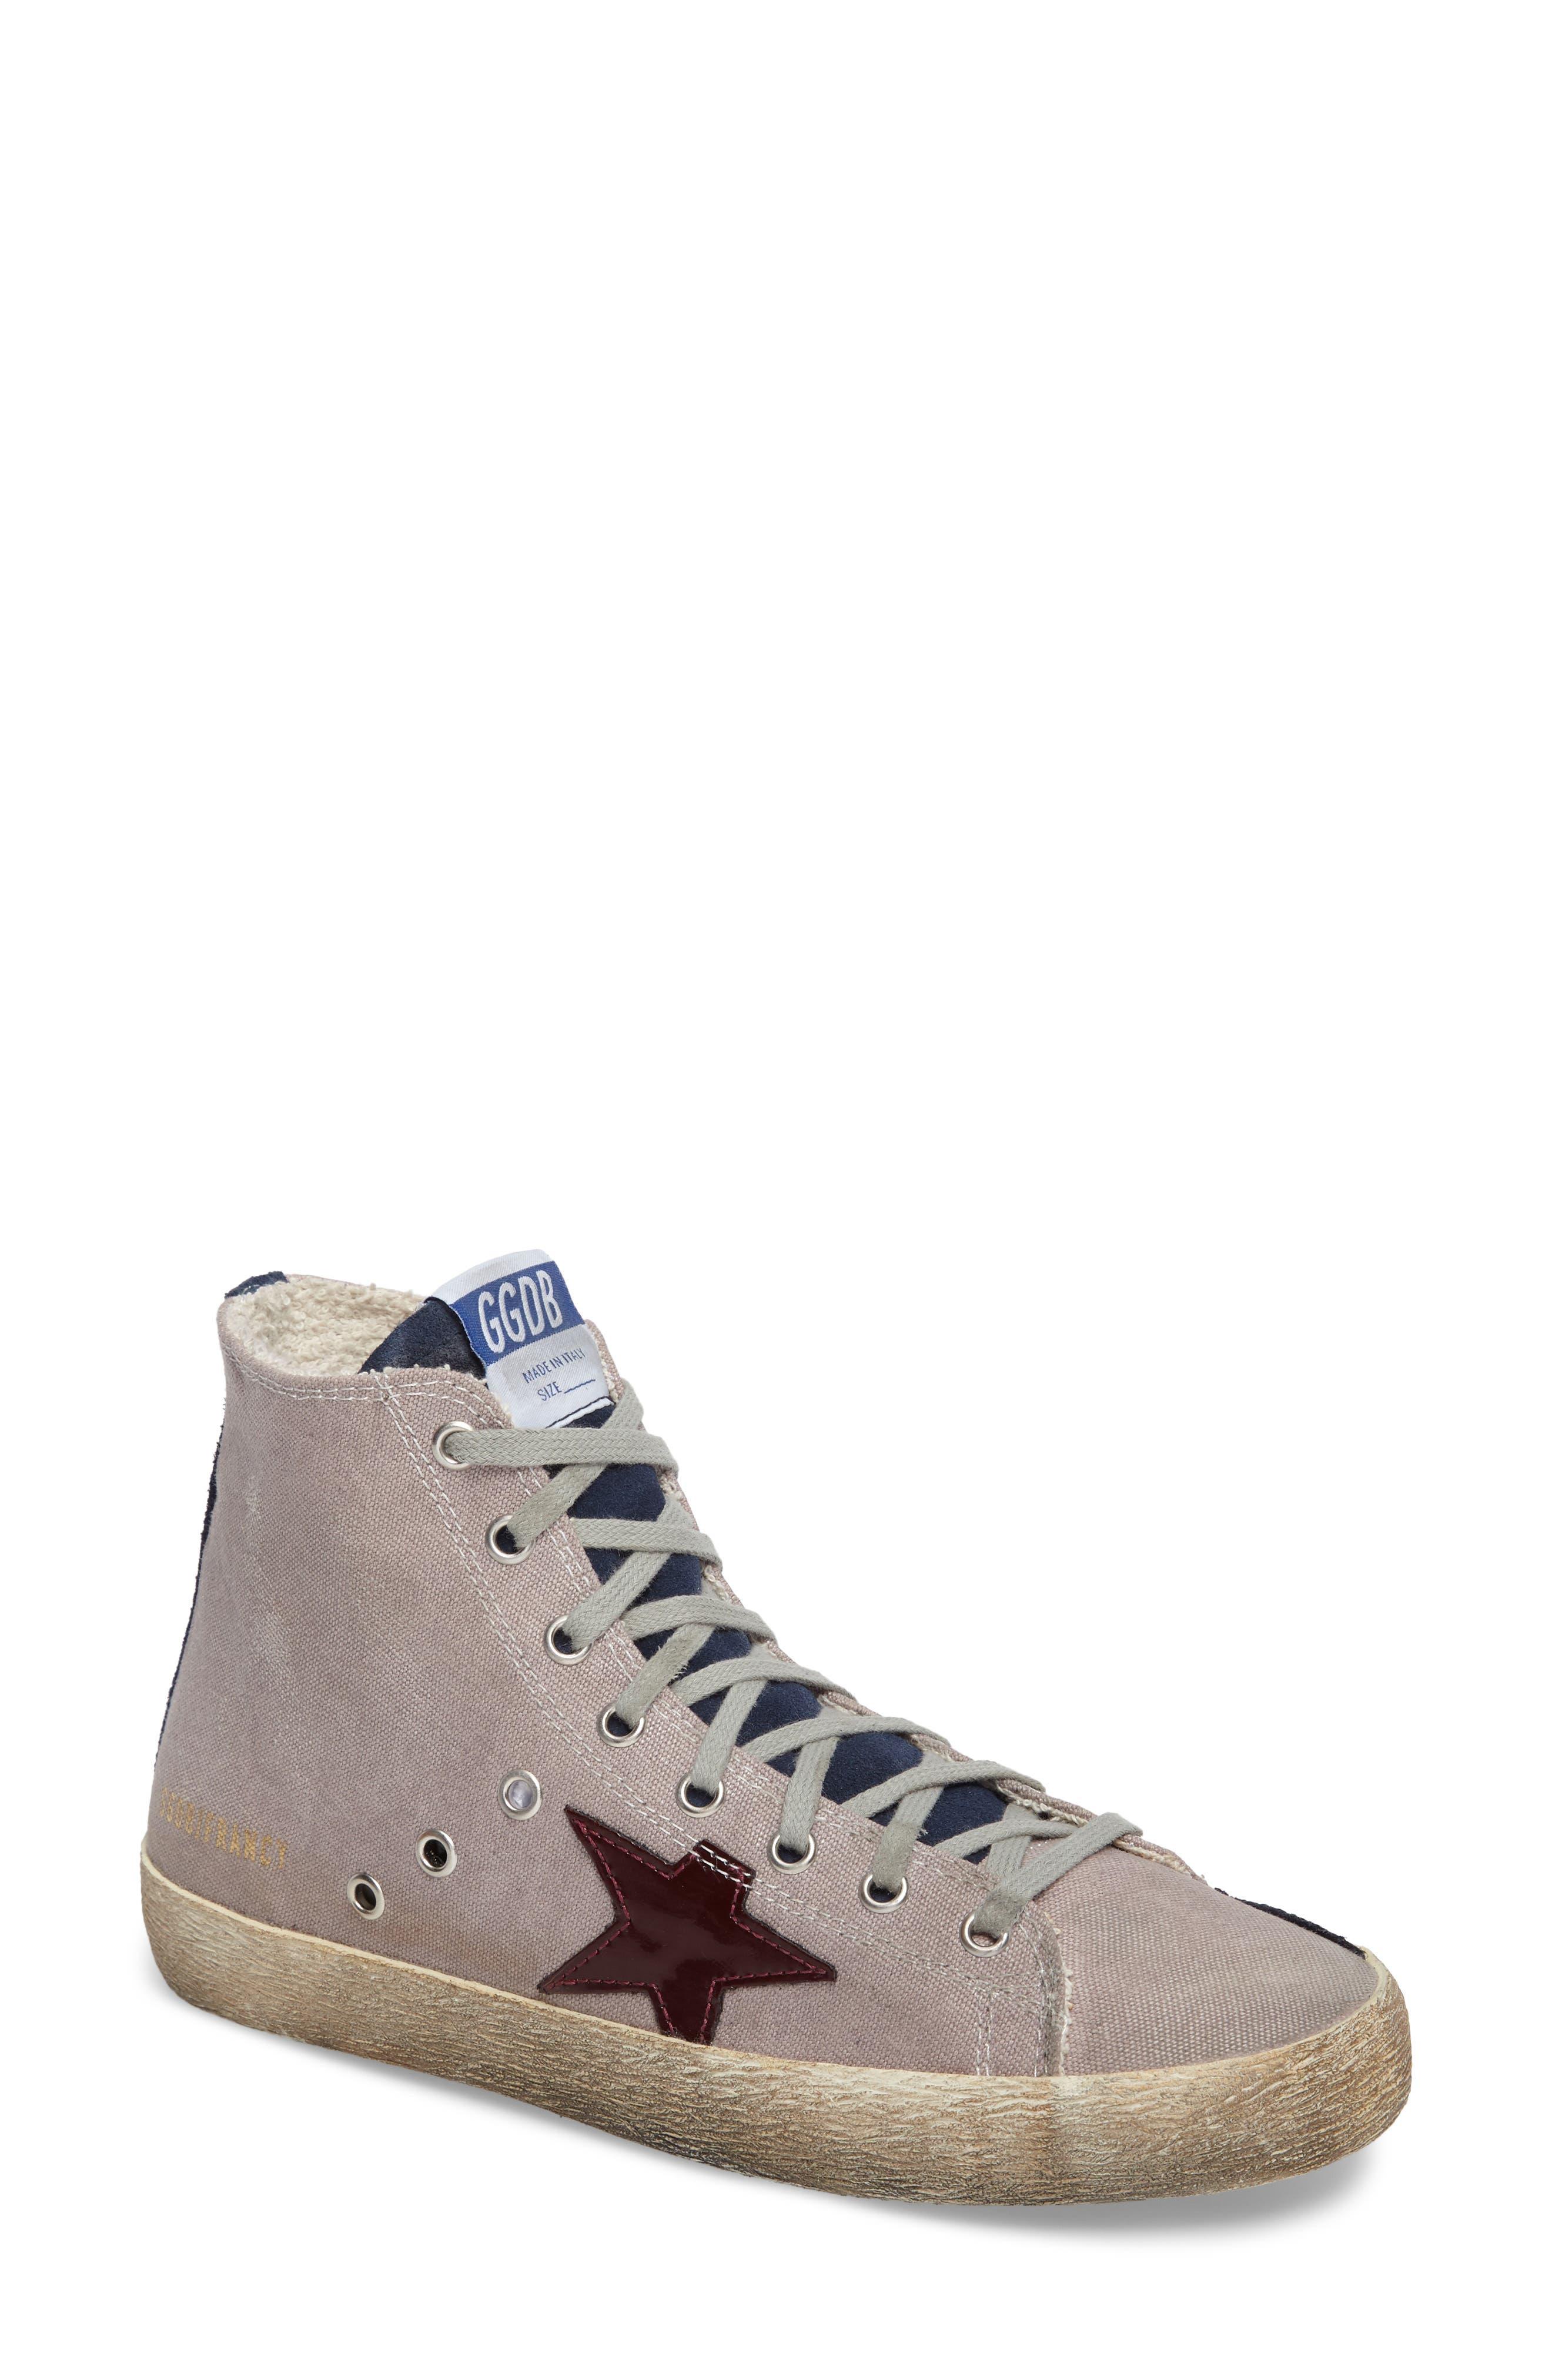 Francy Mid Top Sneaker,                         Main,                         color, 530